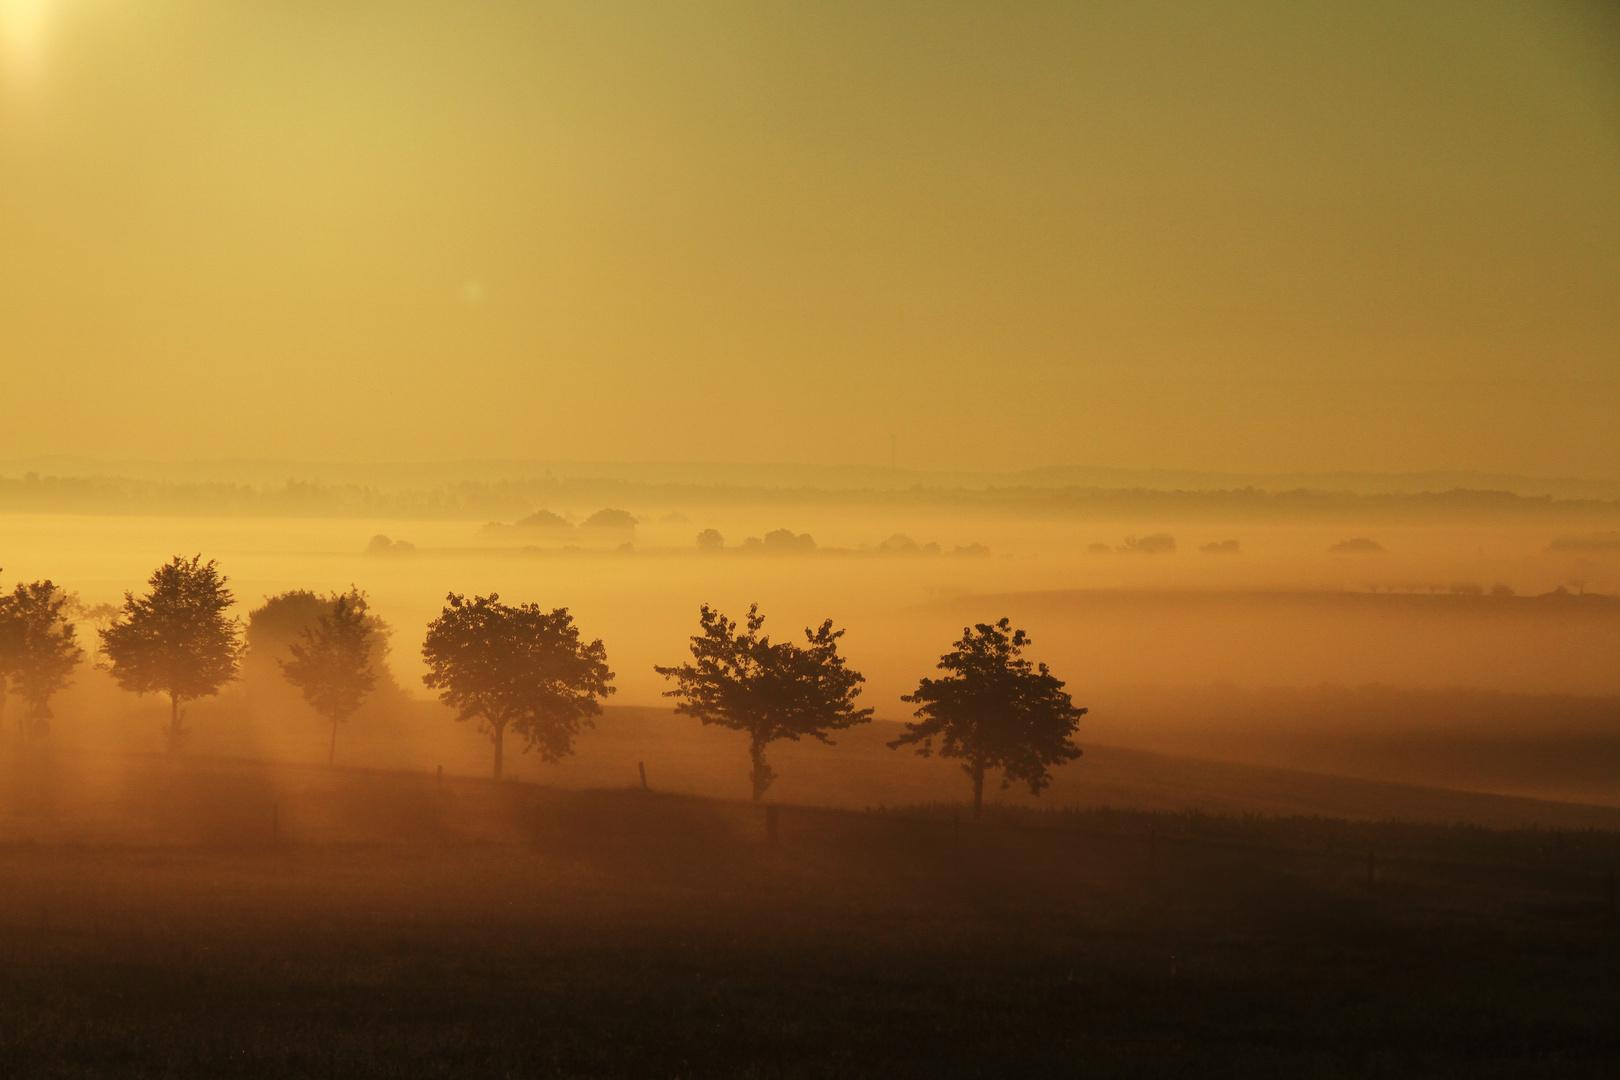 Baumspitzen im Nebel